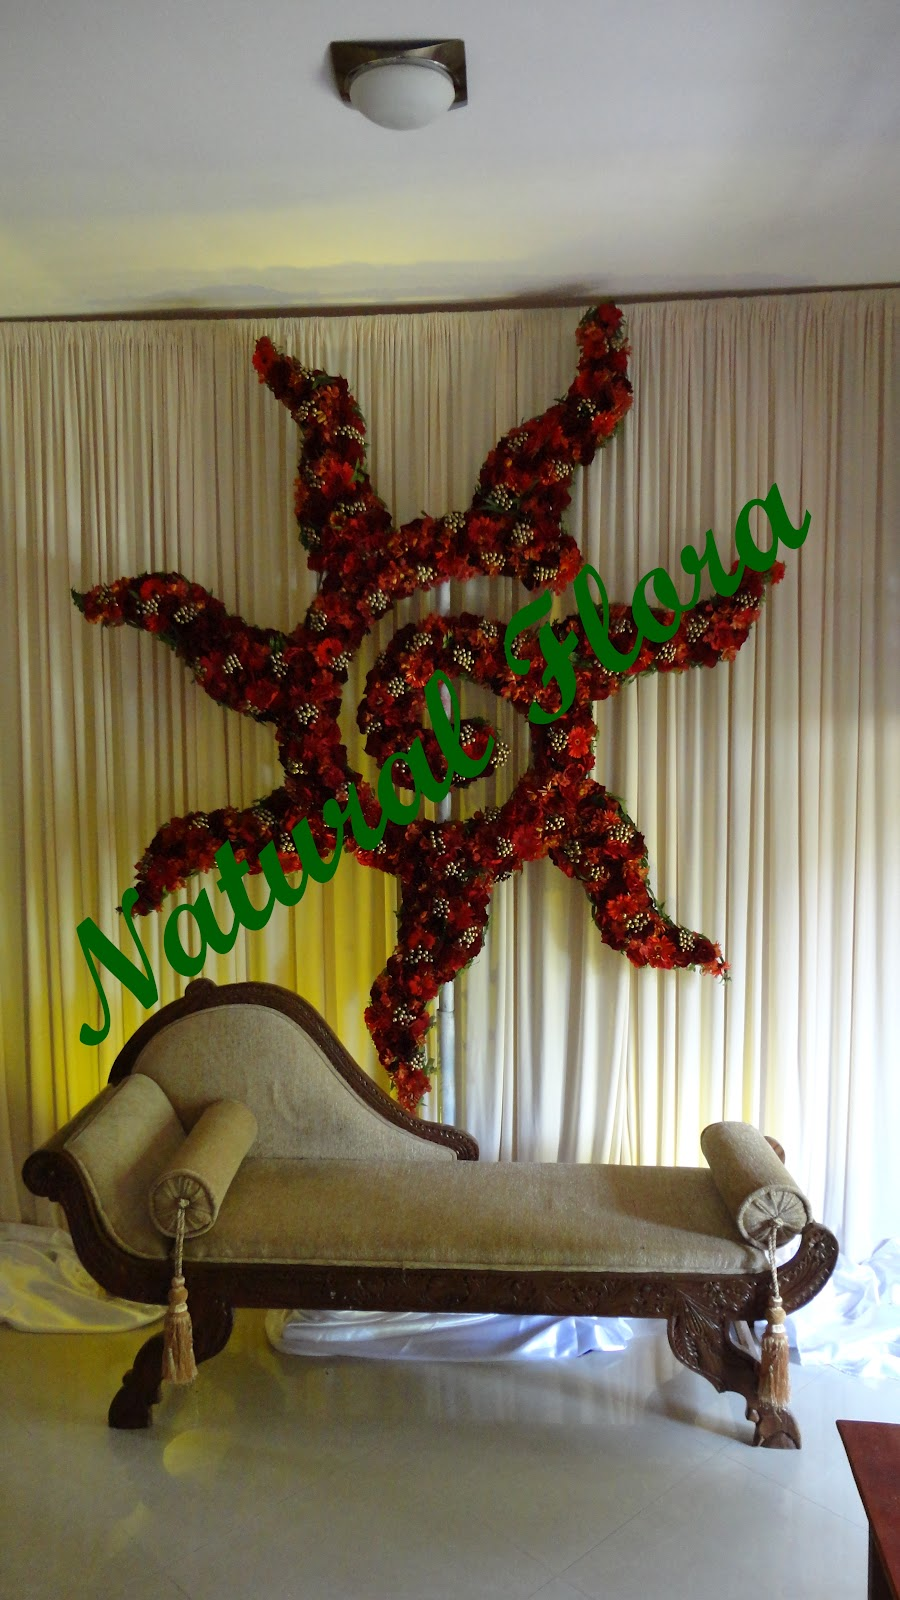 Natural Flora: Natural Flora for Natural Oil Lamp Decorations  110yll